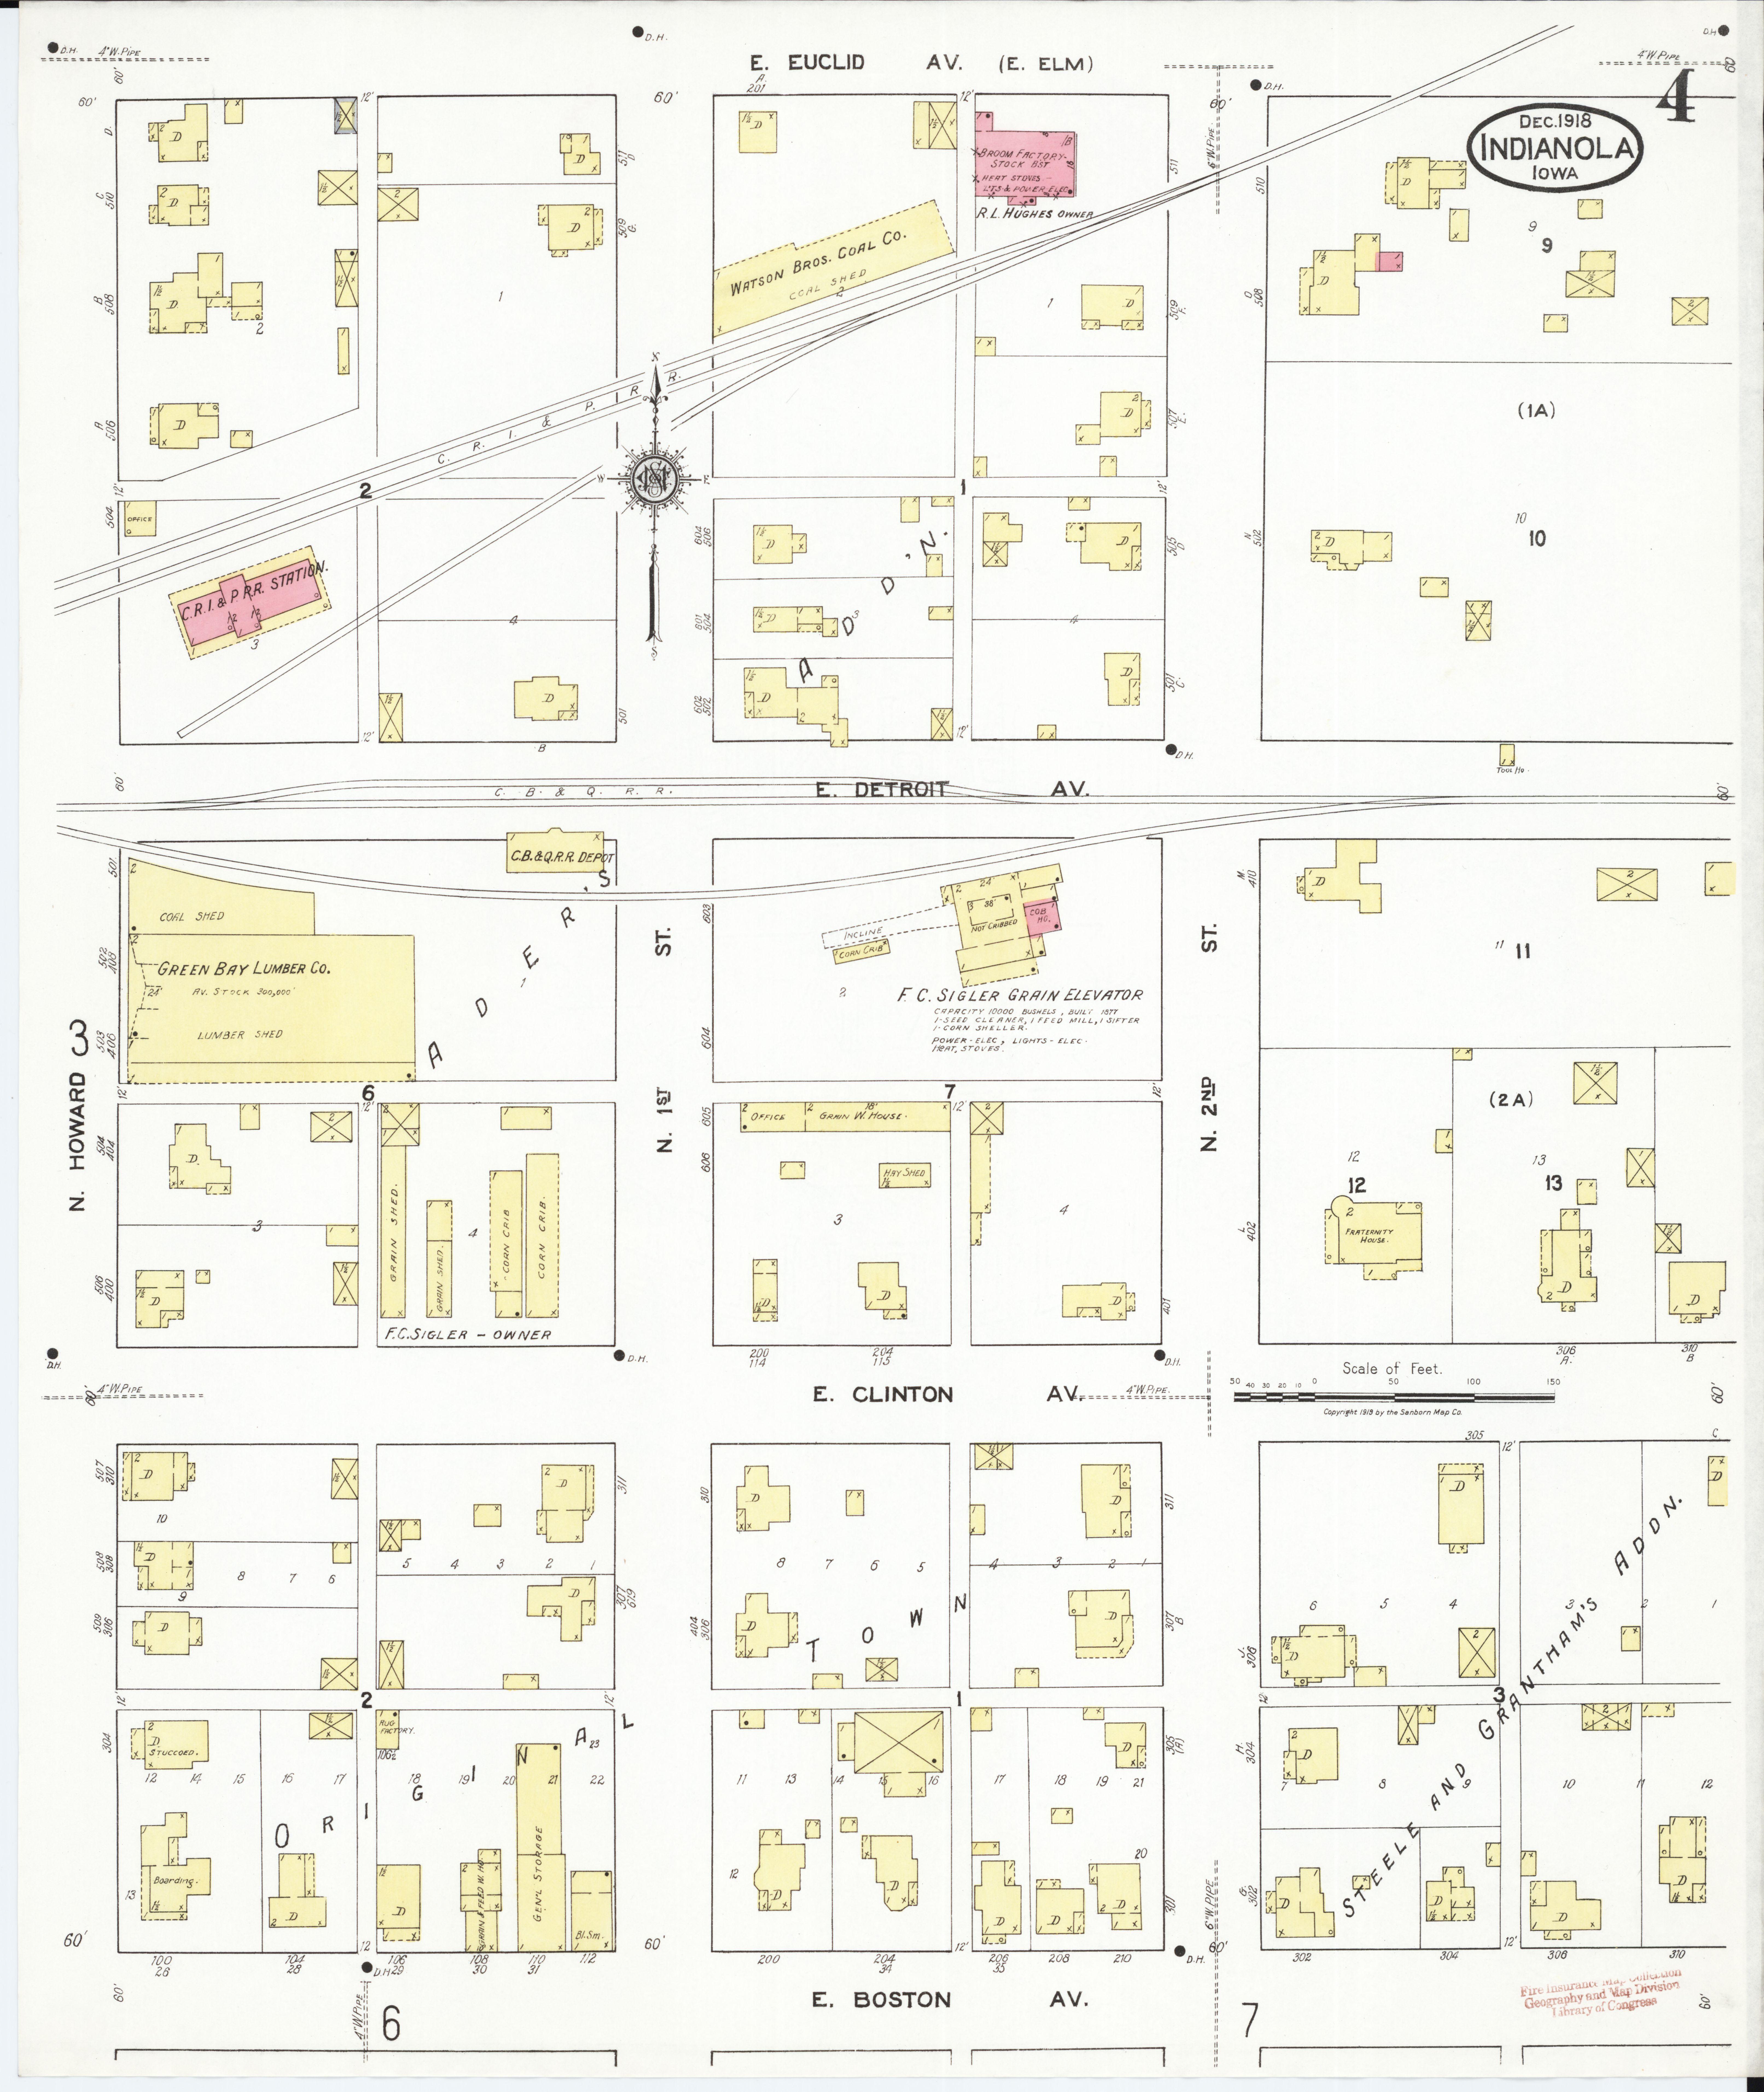 Warren County Iowa Map.File Sanborn Fire Insurance Map From Indianola Warren County Iowa